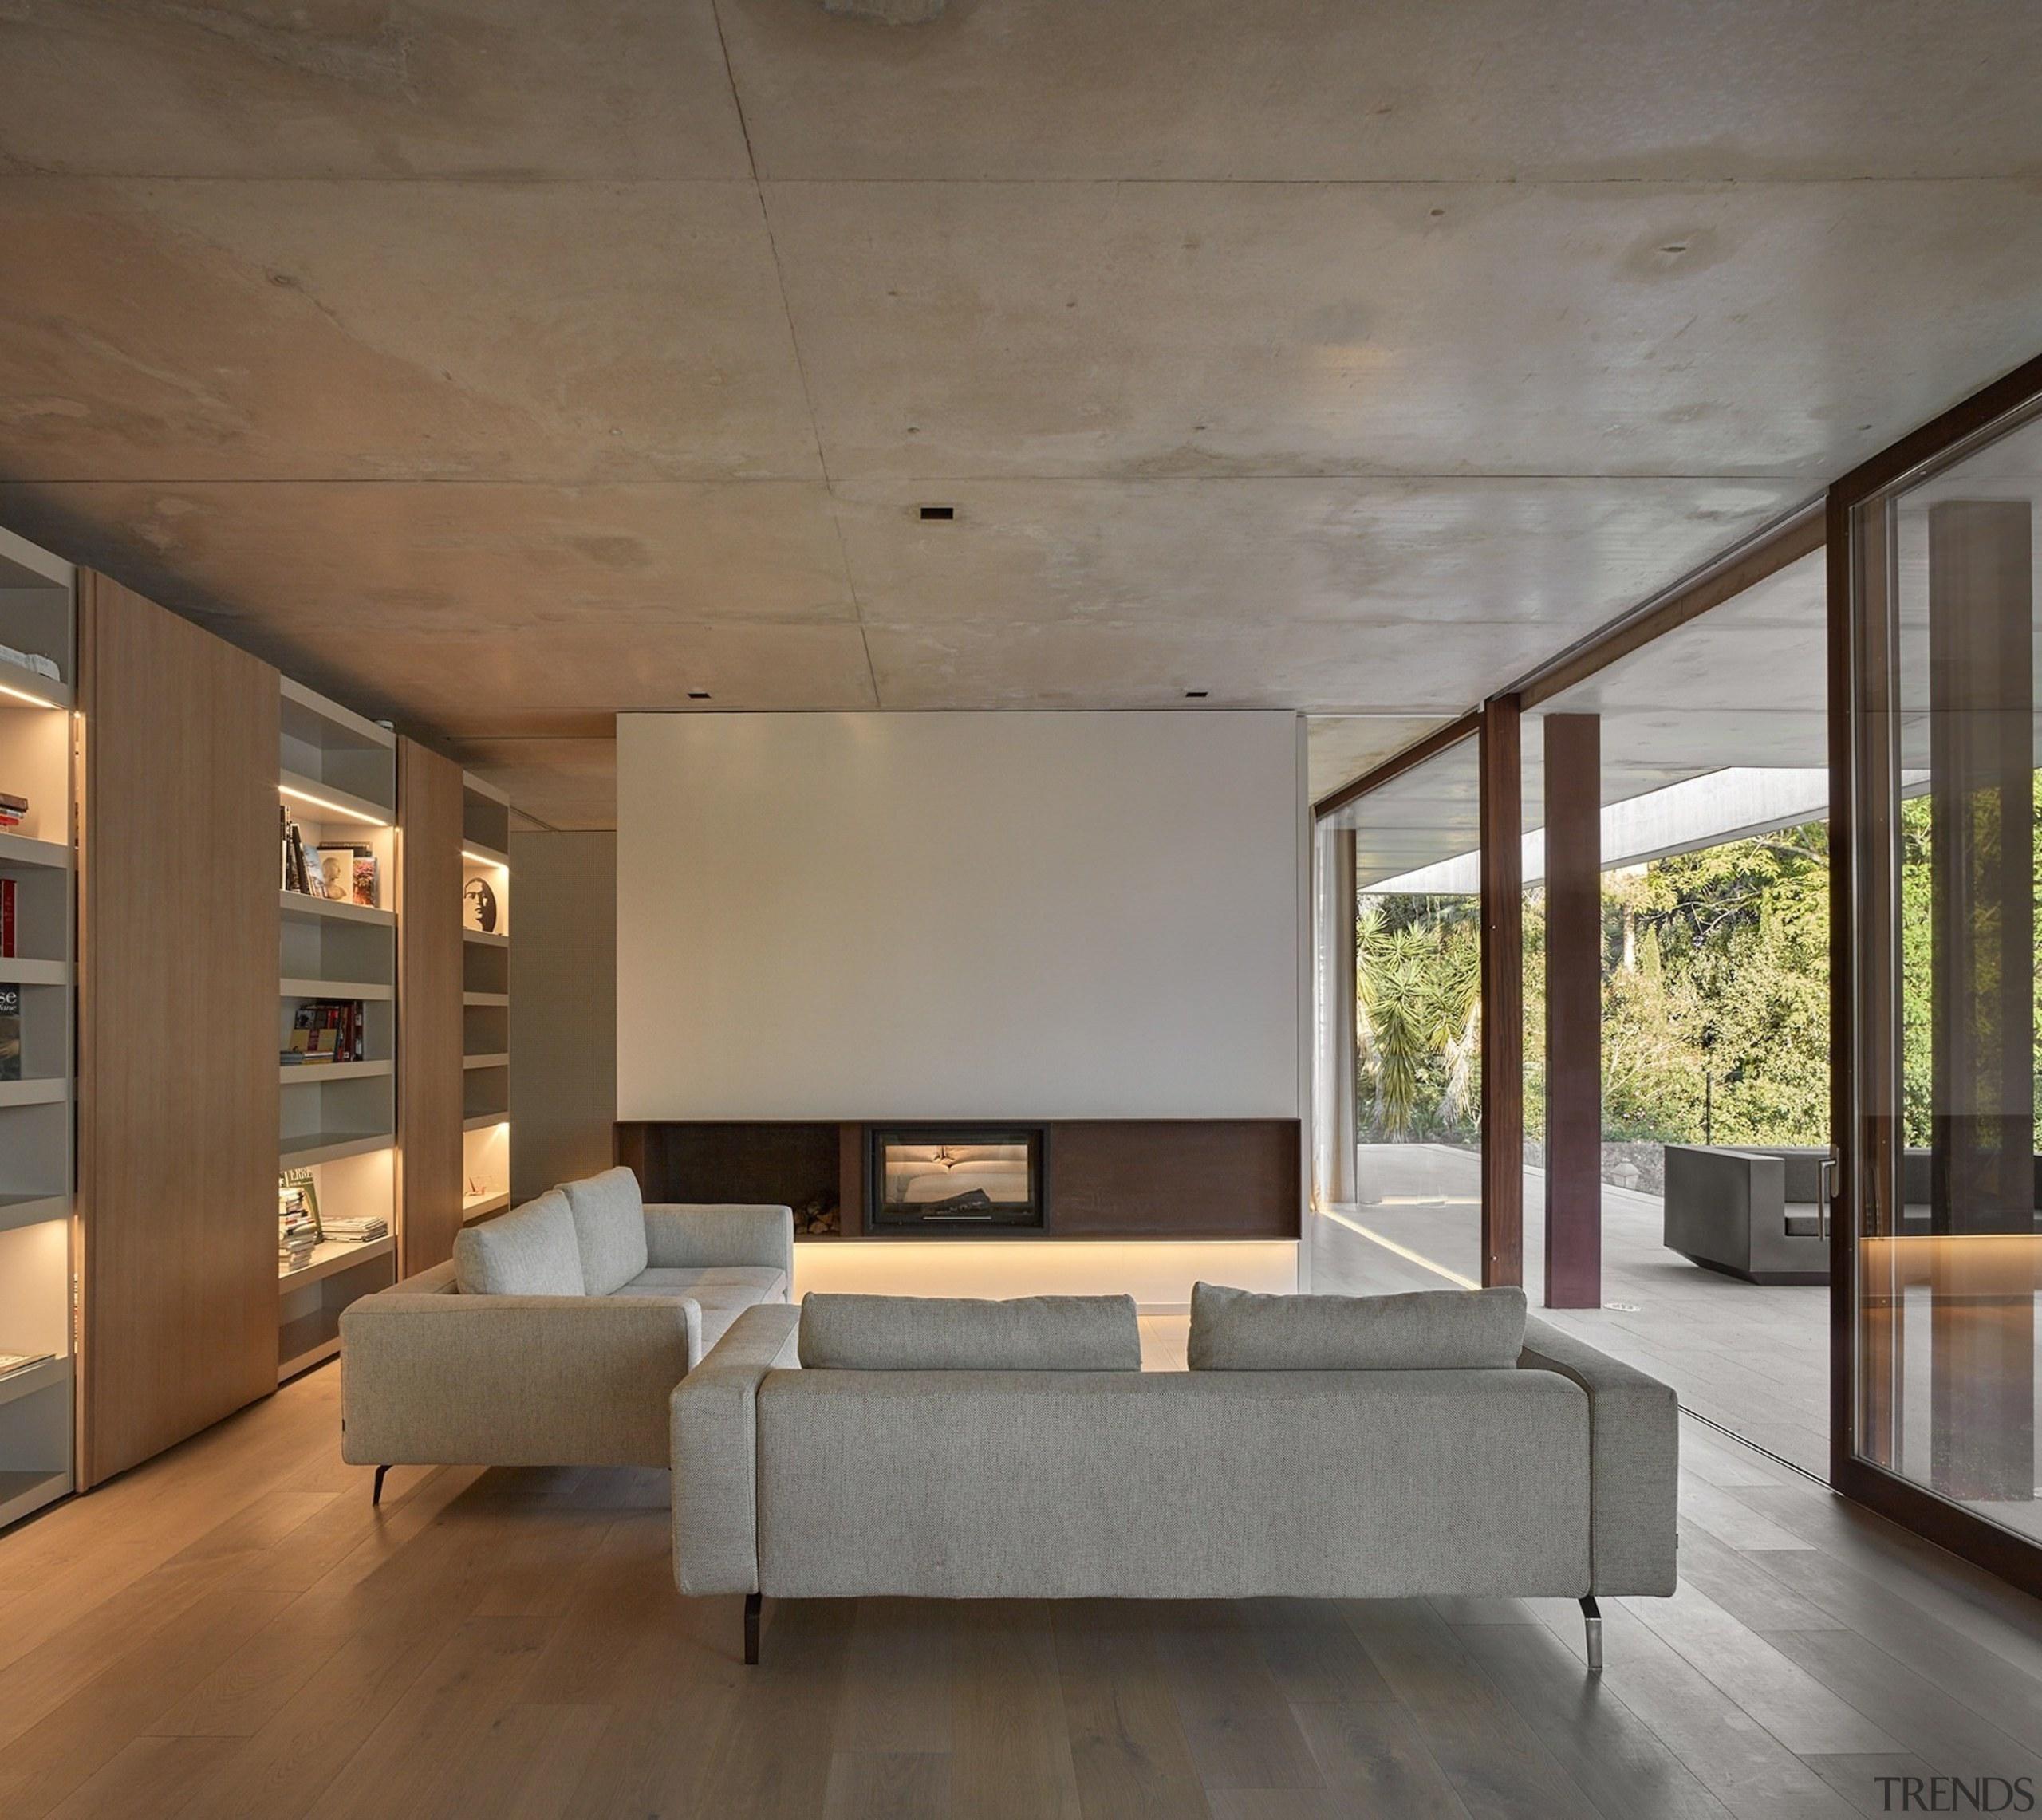 Architect: Ramón Esteve Estudio de Arquitectura architecture, bed frame, ceiling, daylighting, floor, flooring, furniture, house, interior design, living room, wall, wood flooring, gray, brown